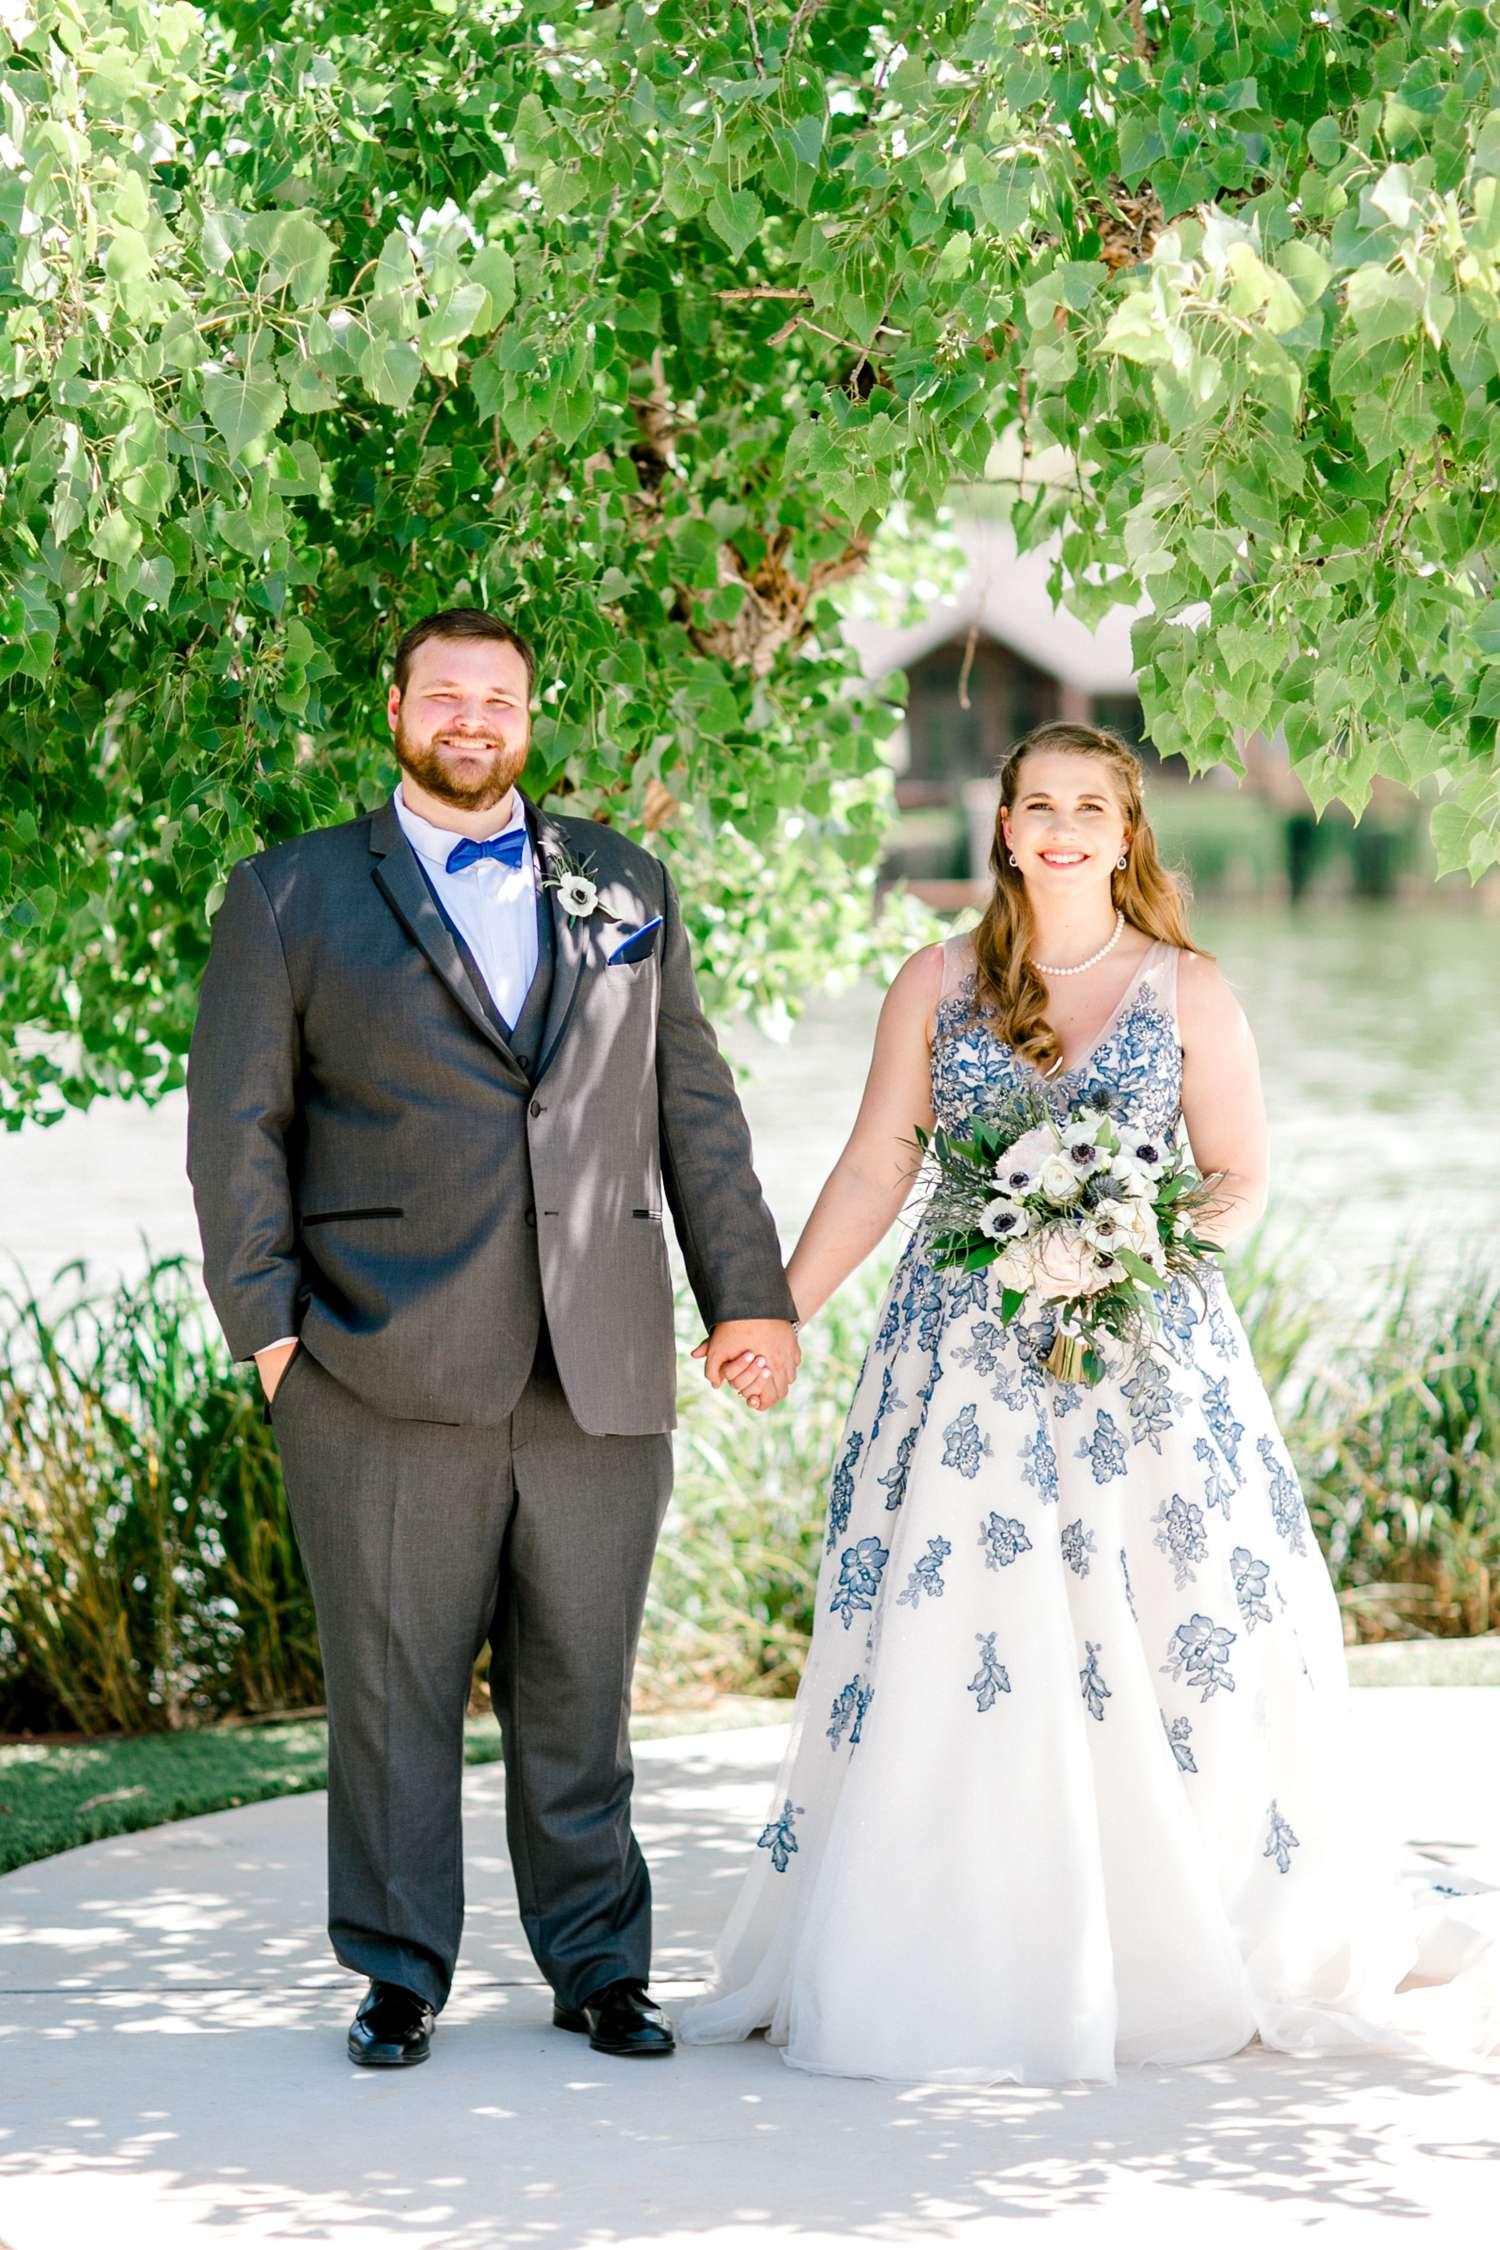 TY+NATHAN+HALLIER+ALLEEJ+WEDDING+PHOTOGRAPHER+RANSOM+CANYON_0050.jpg